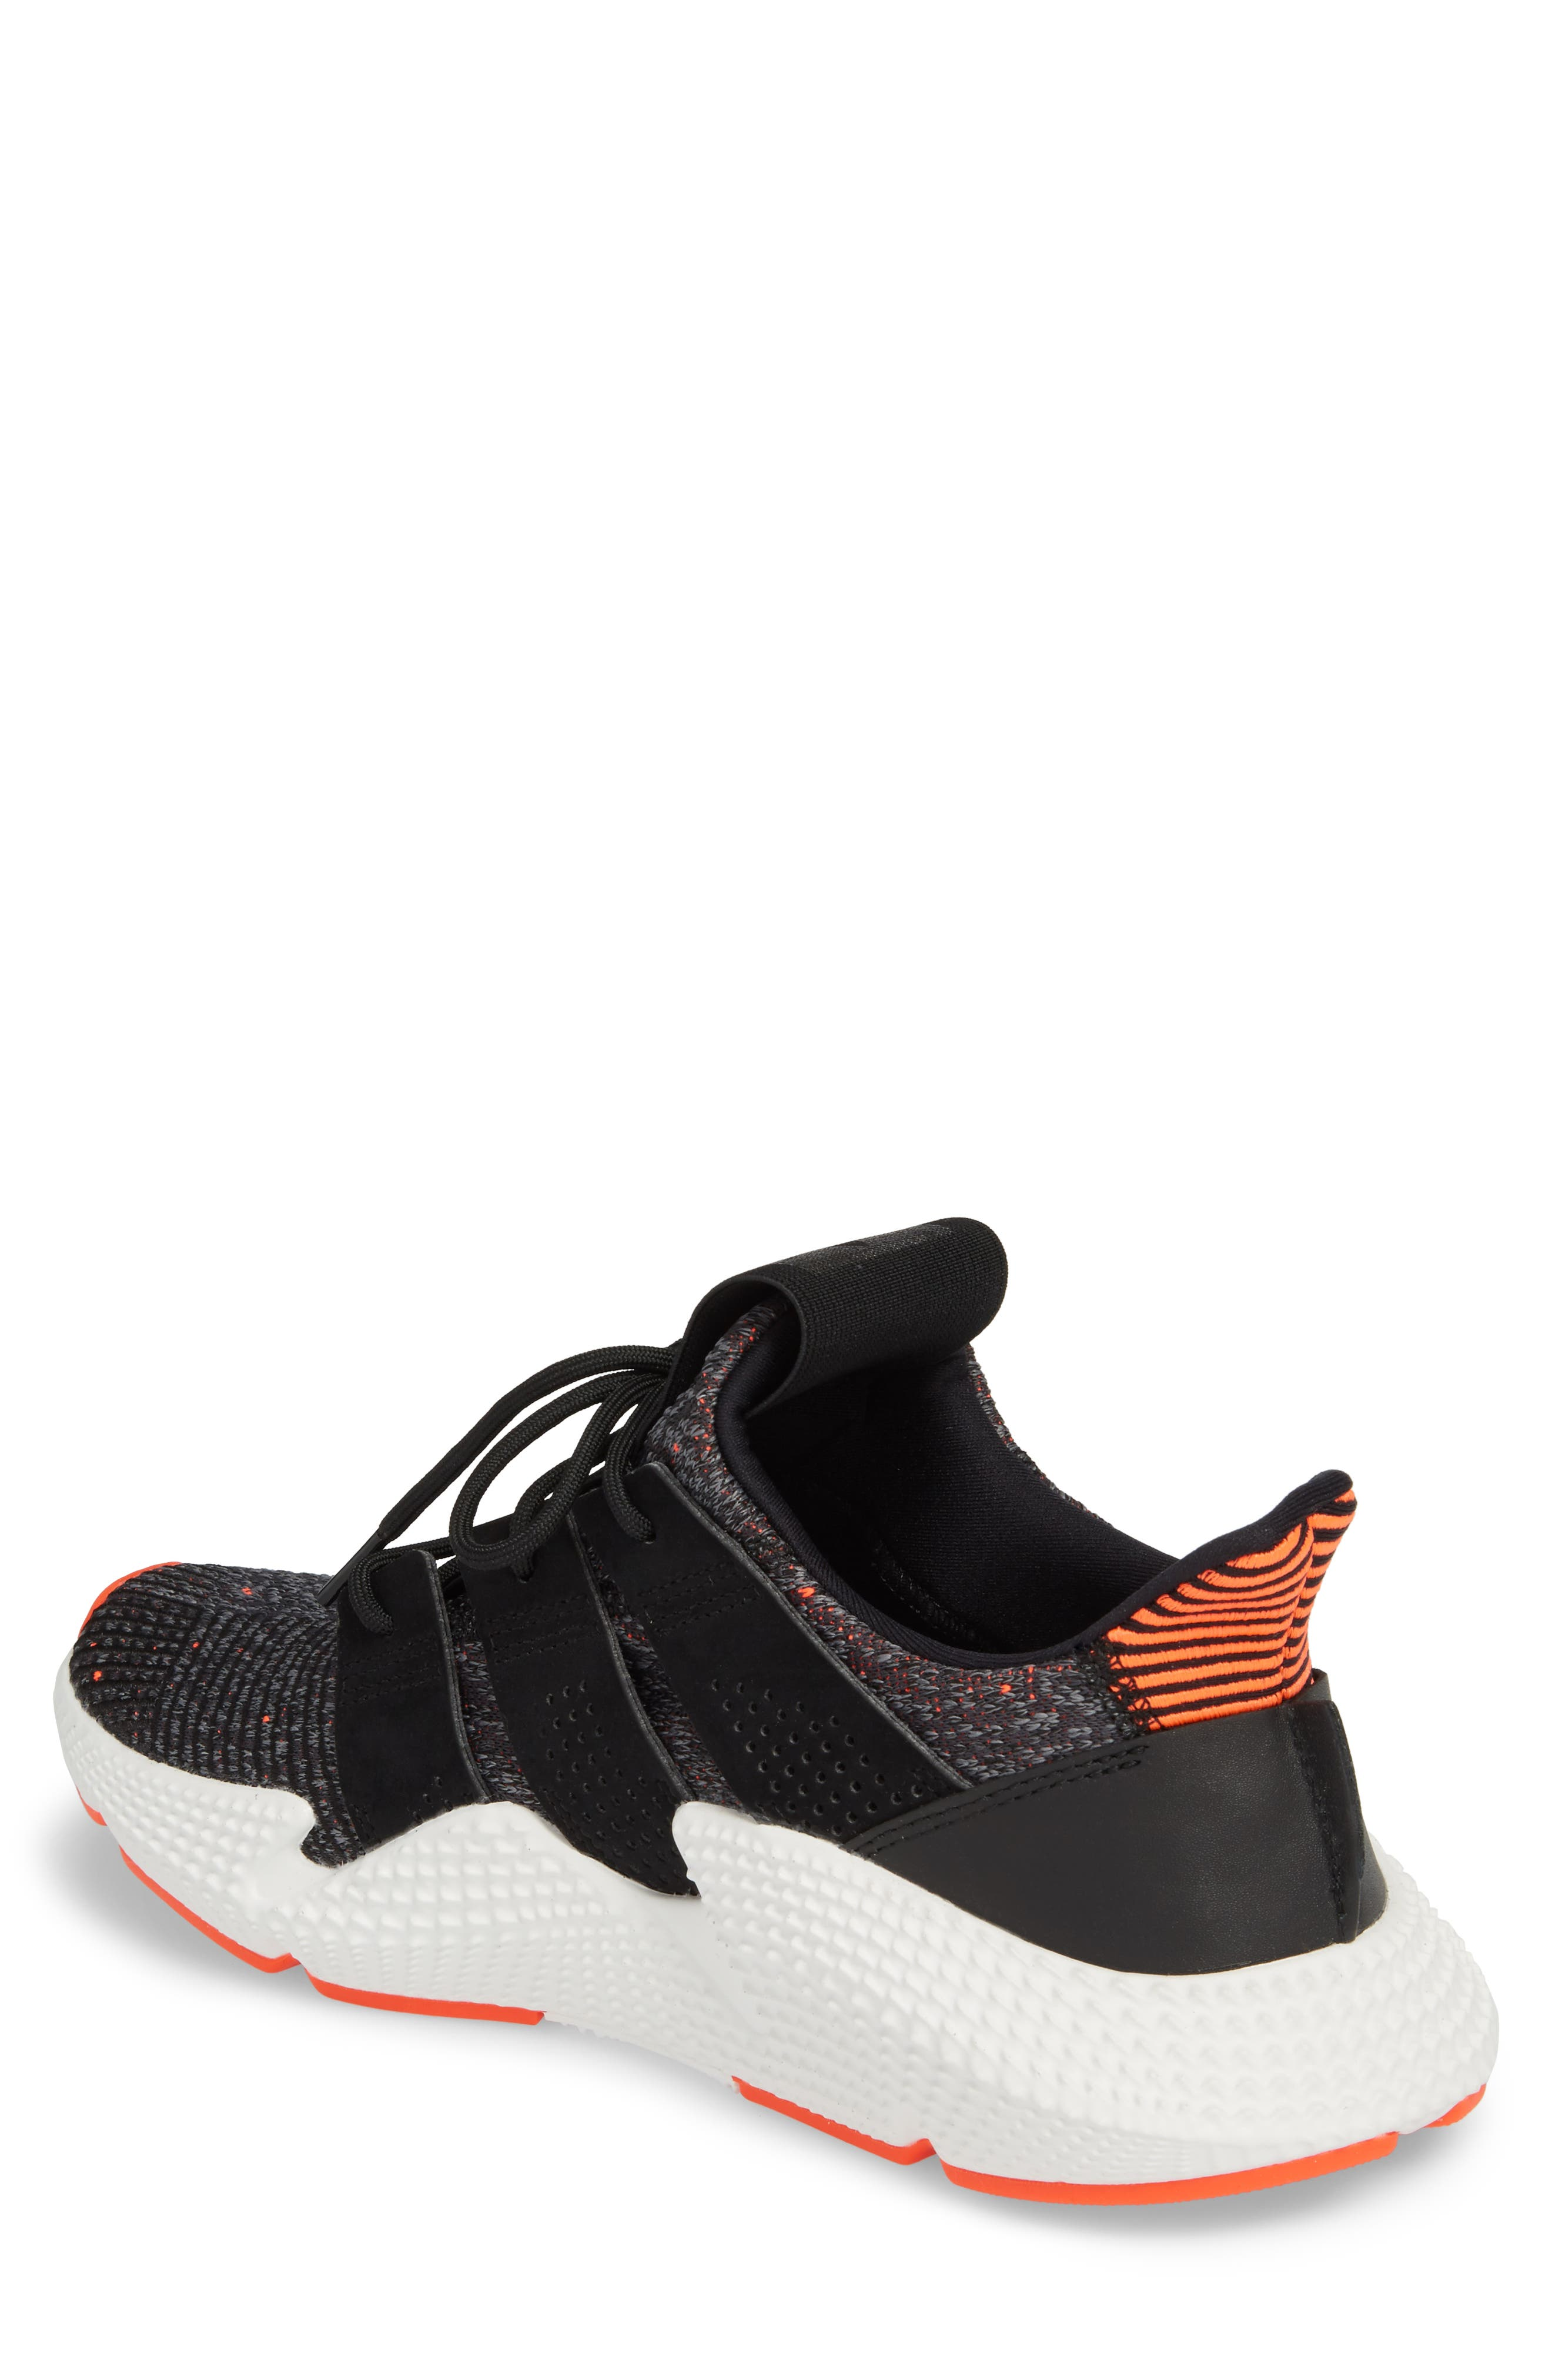 Prophere Sneaker,                             Alternate thumbnail 2, color,                             Black/ Solar Red